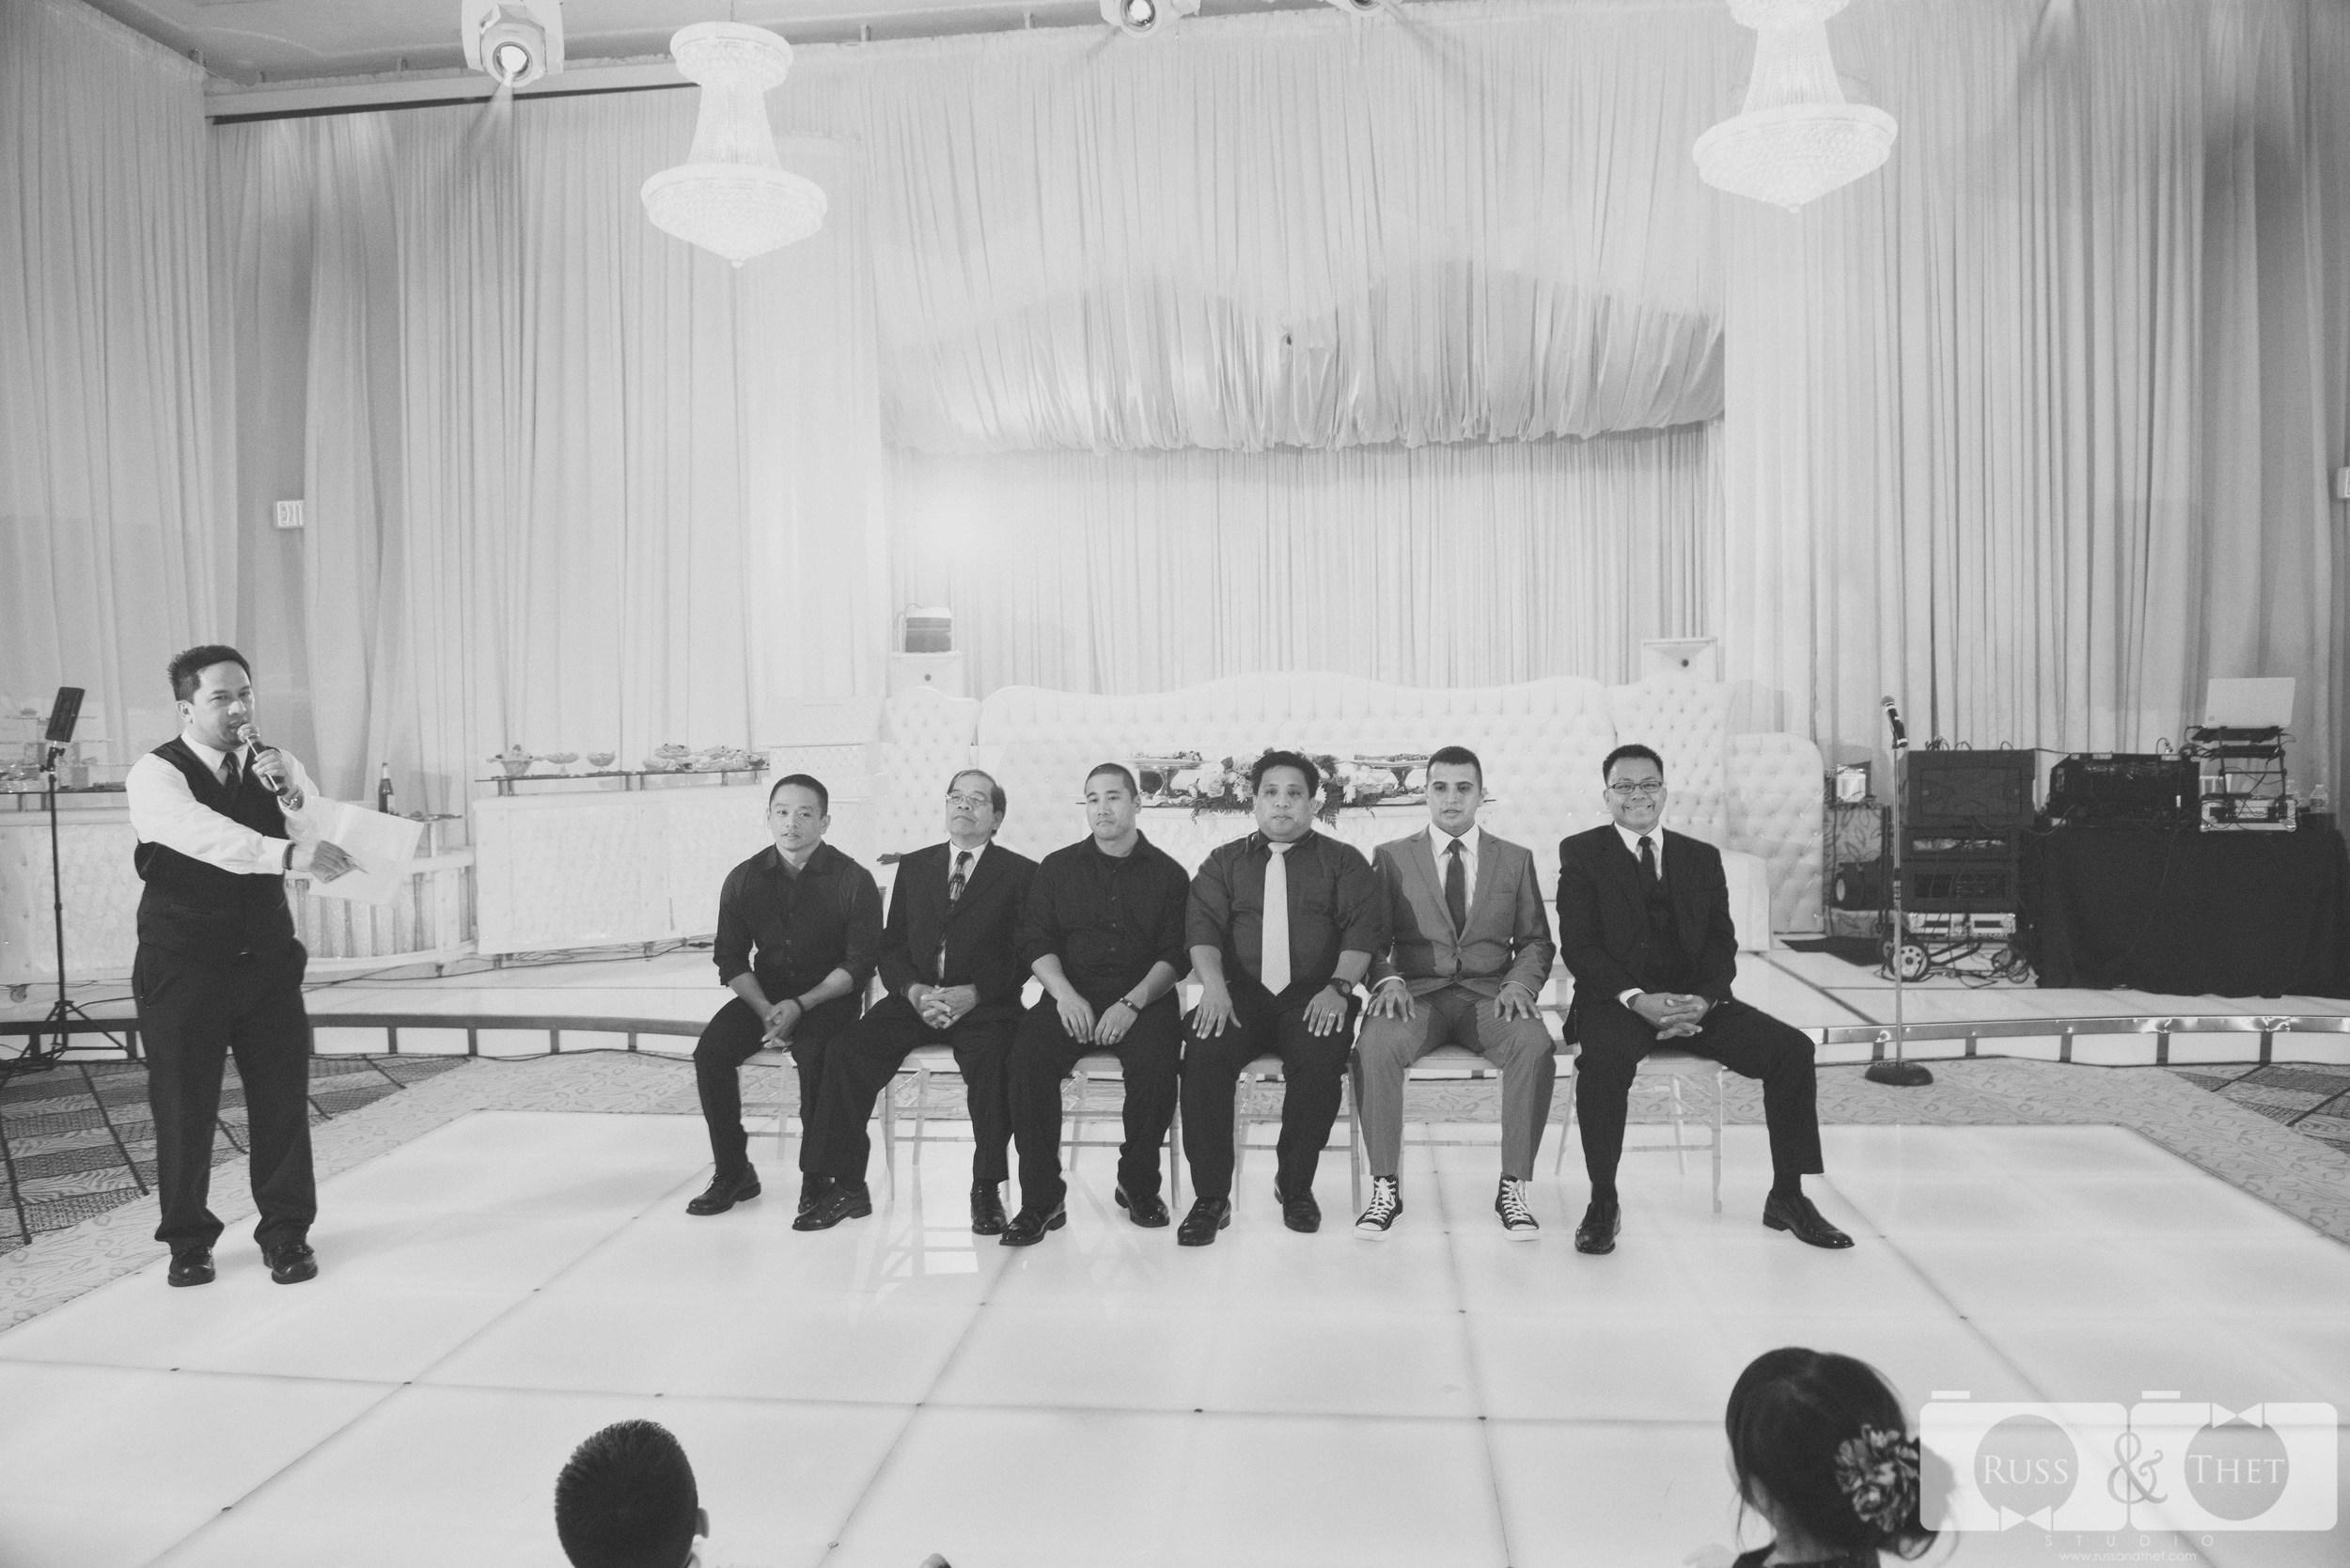 royal-palace-banquet-hall-glendale-wedding-71.JPG